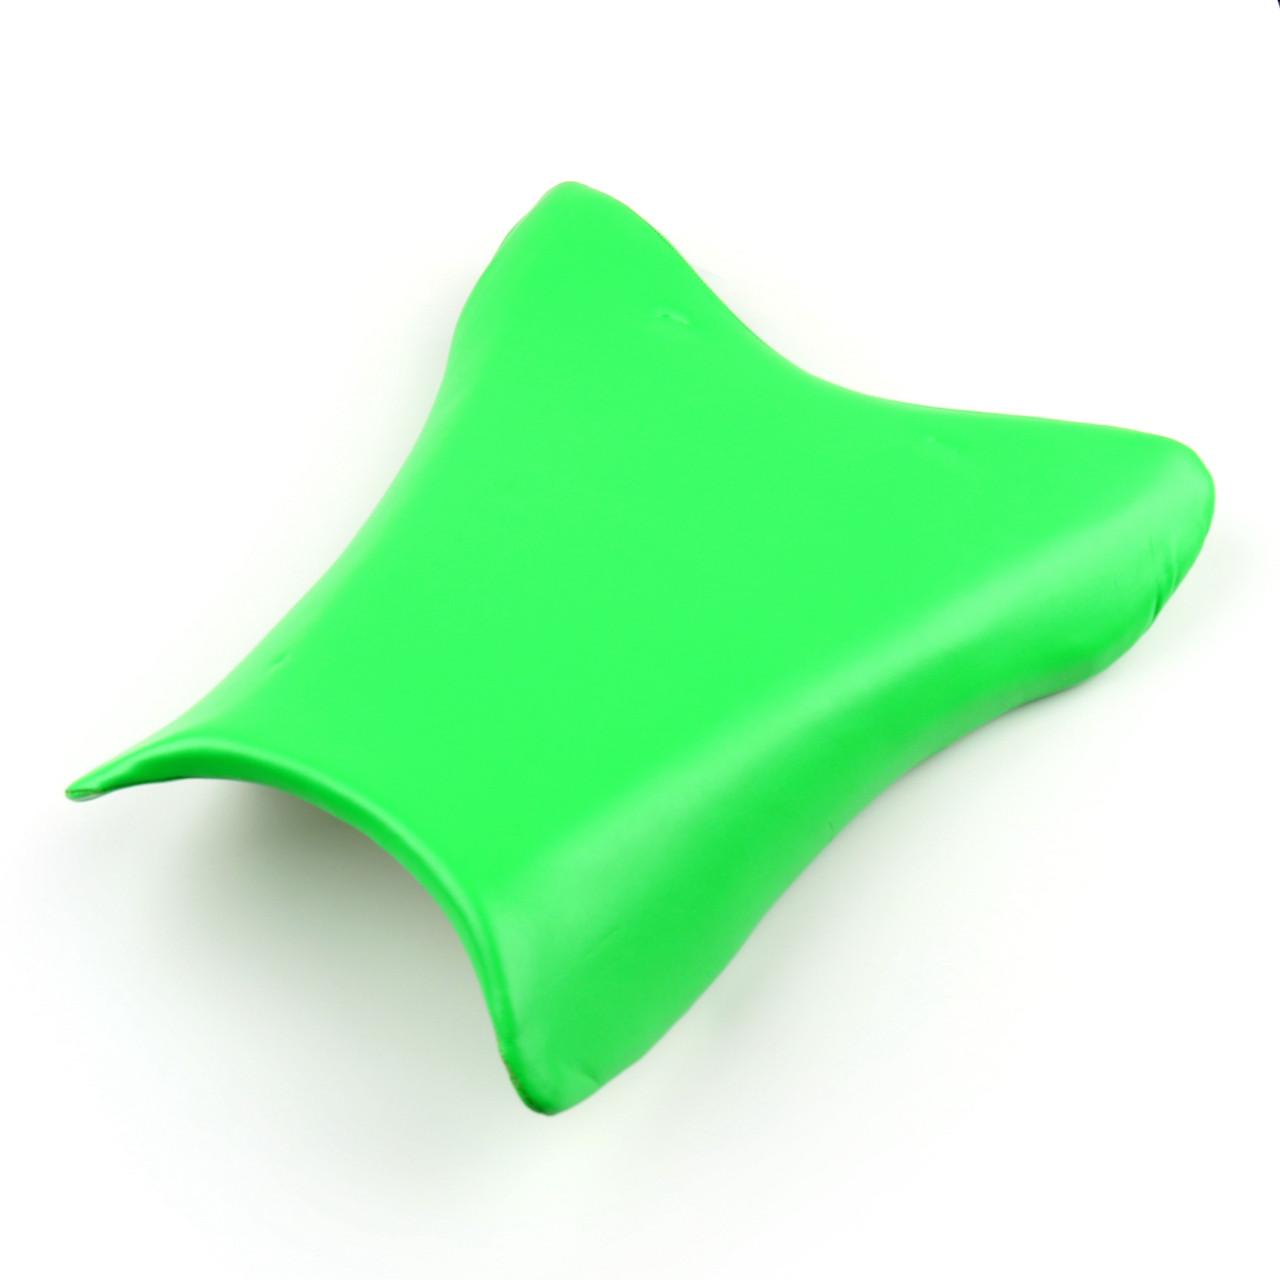 http://www.madhornets.store/AMZ/MotoPart/SeatLeather/M512-F034/M512-F034-Green-1.jpg